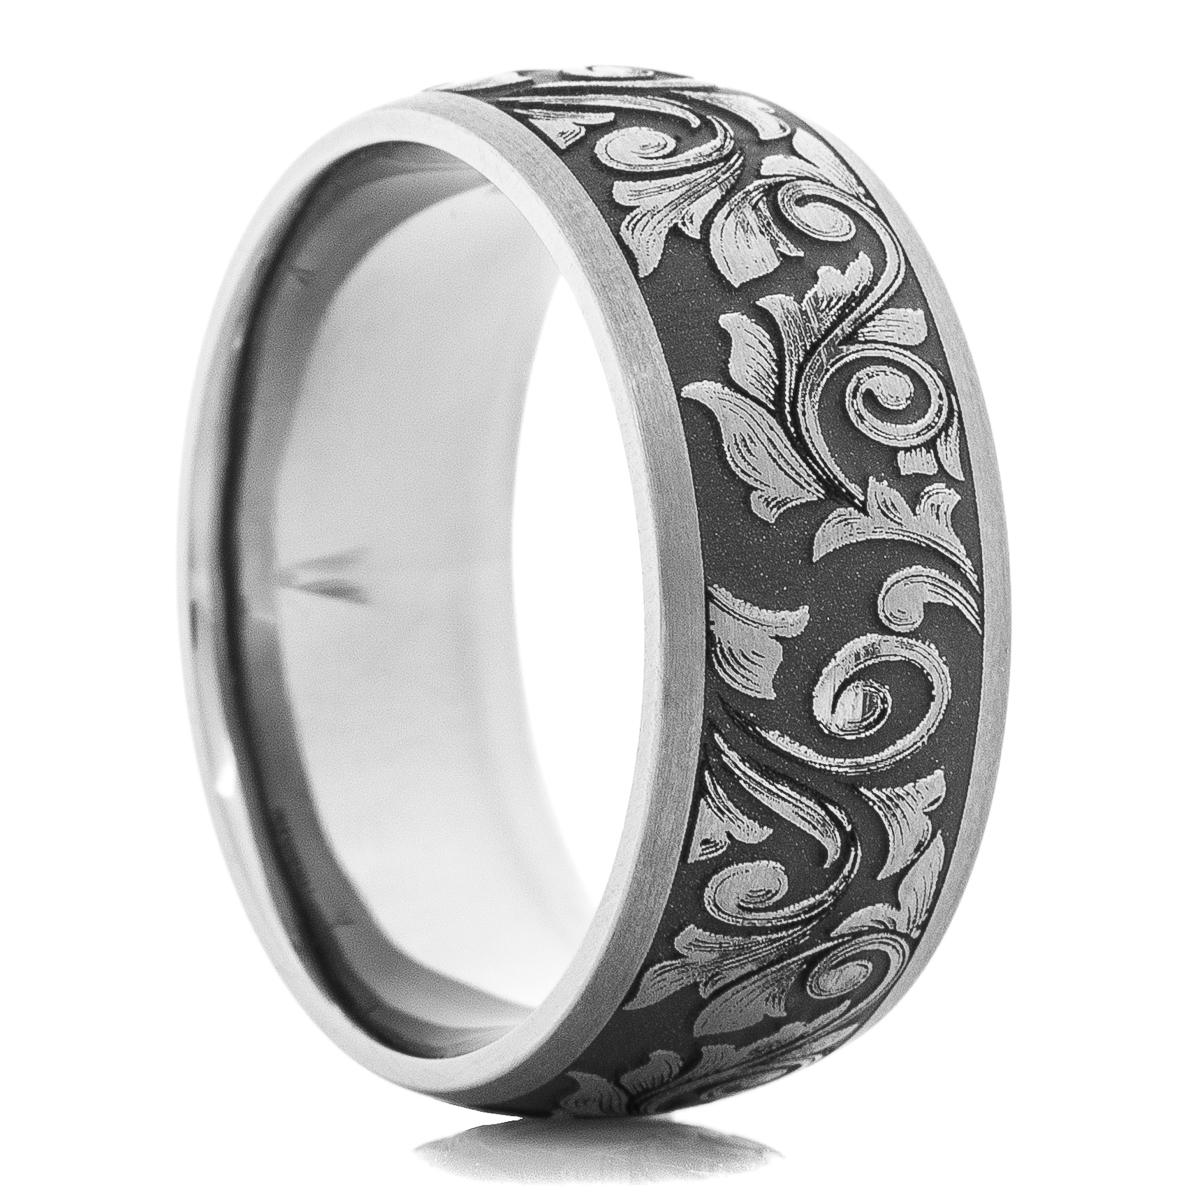 Men's Western Themed Tantalum Ring